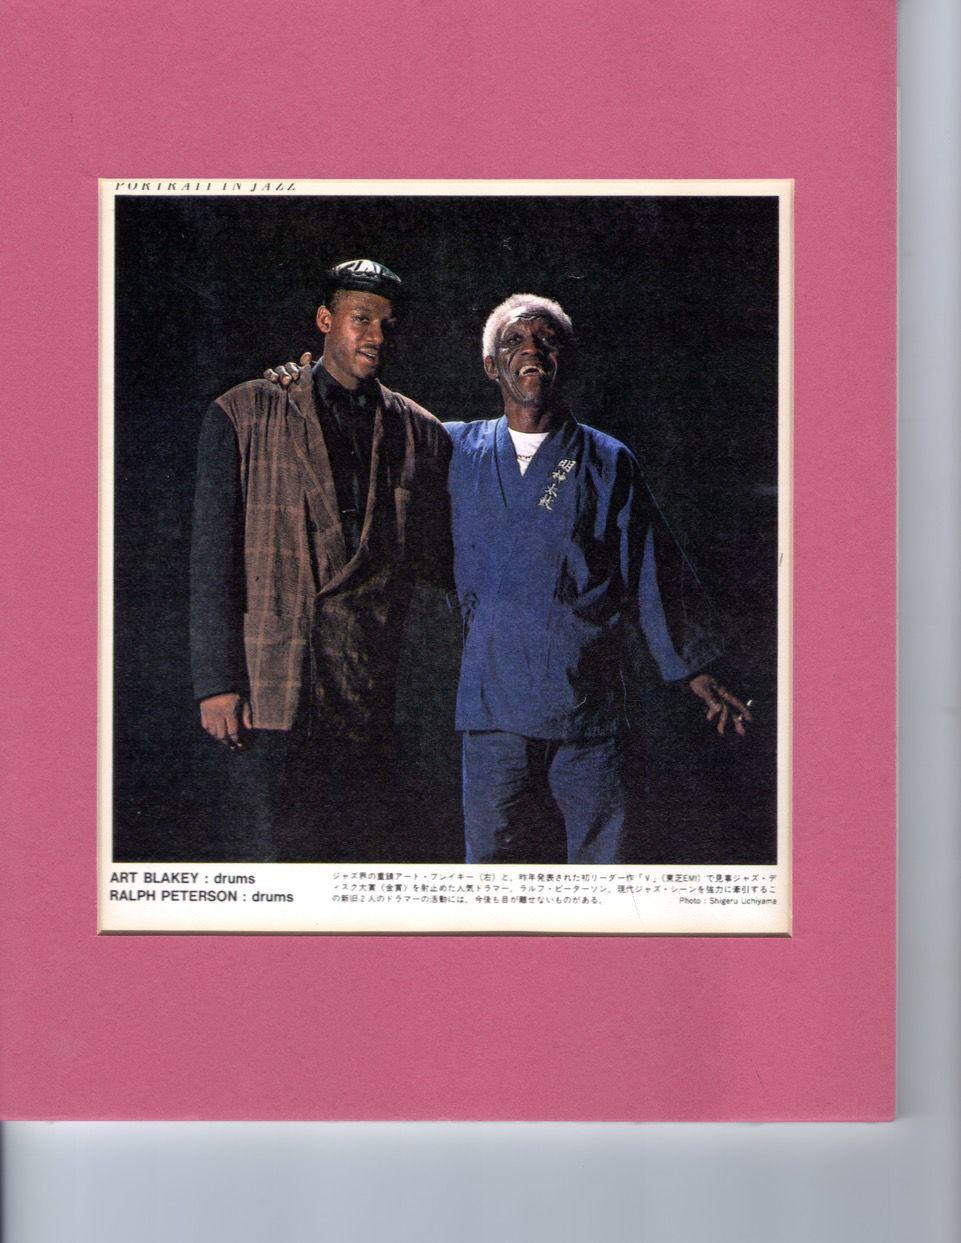 Ralph Peterson and Art Blakey